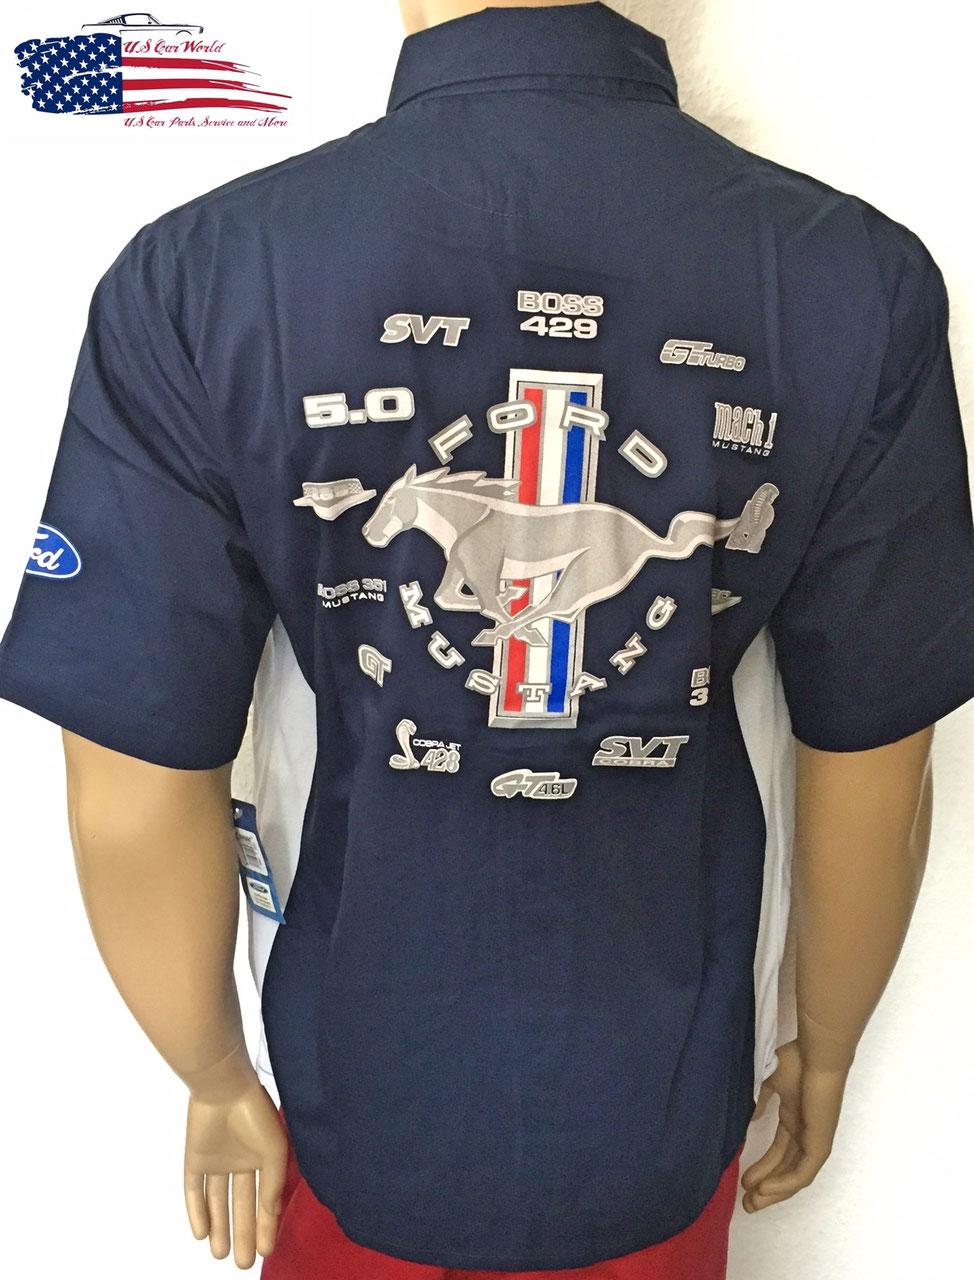 beliebte Marke Ausverkauf Gutscheincode Mustang Hemden & Polos